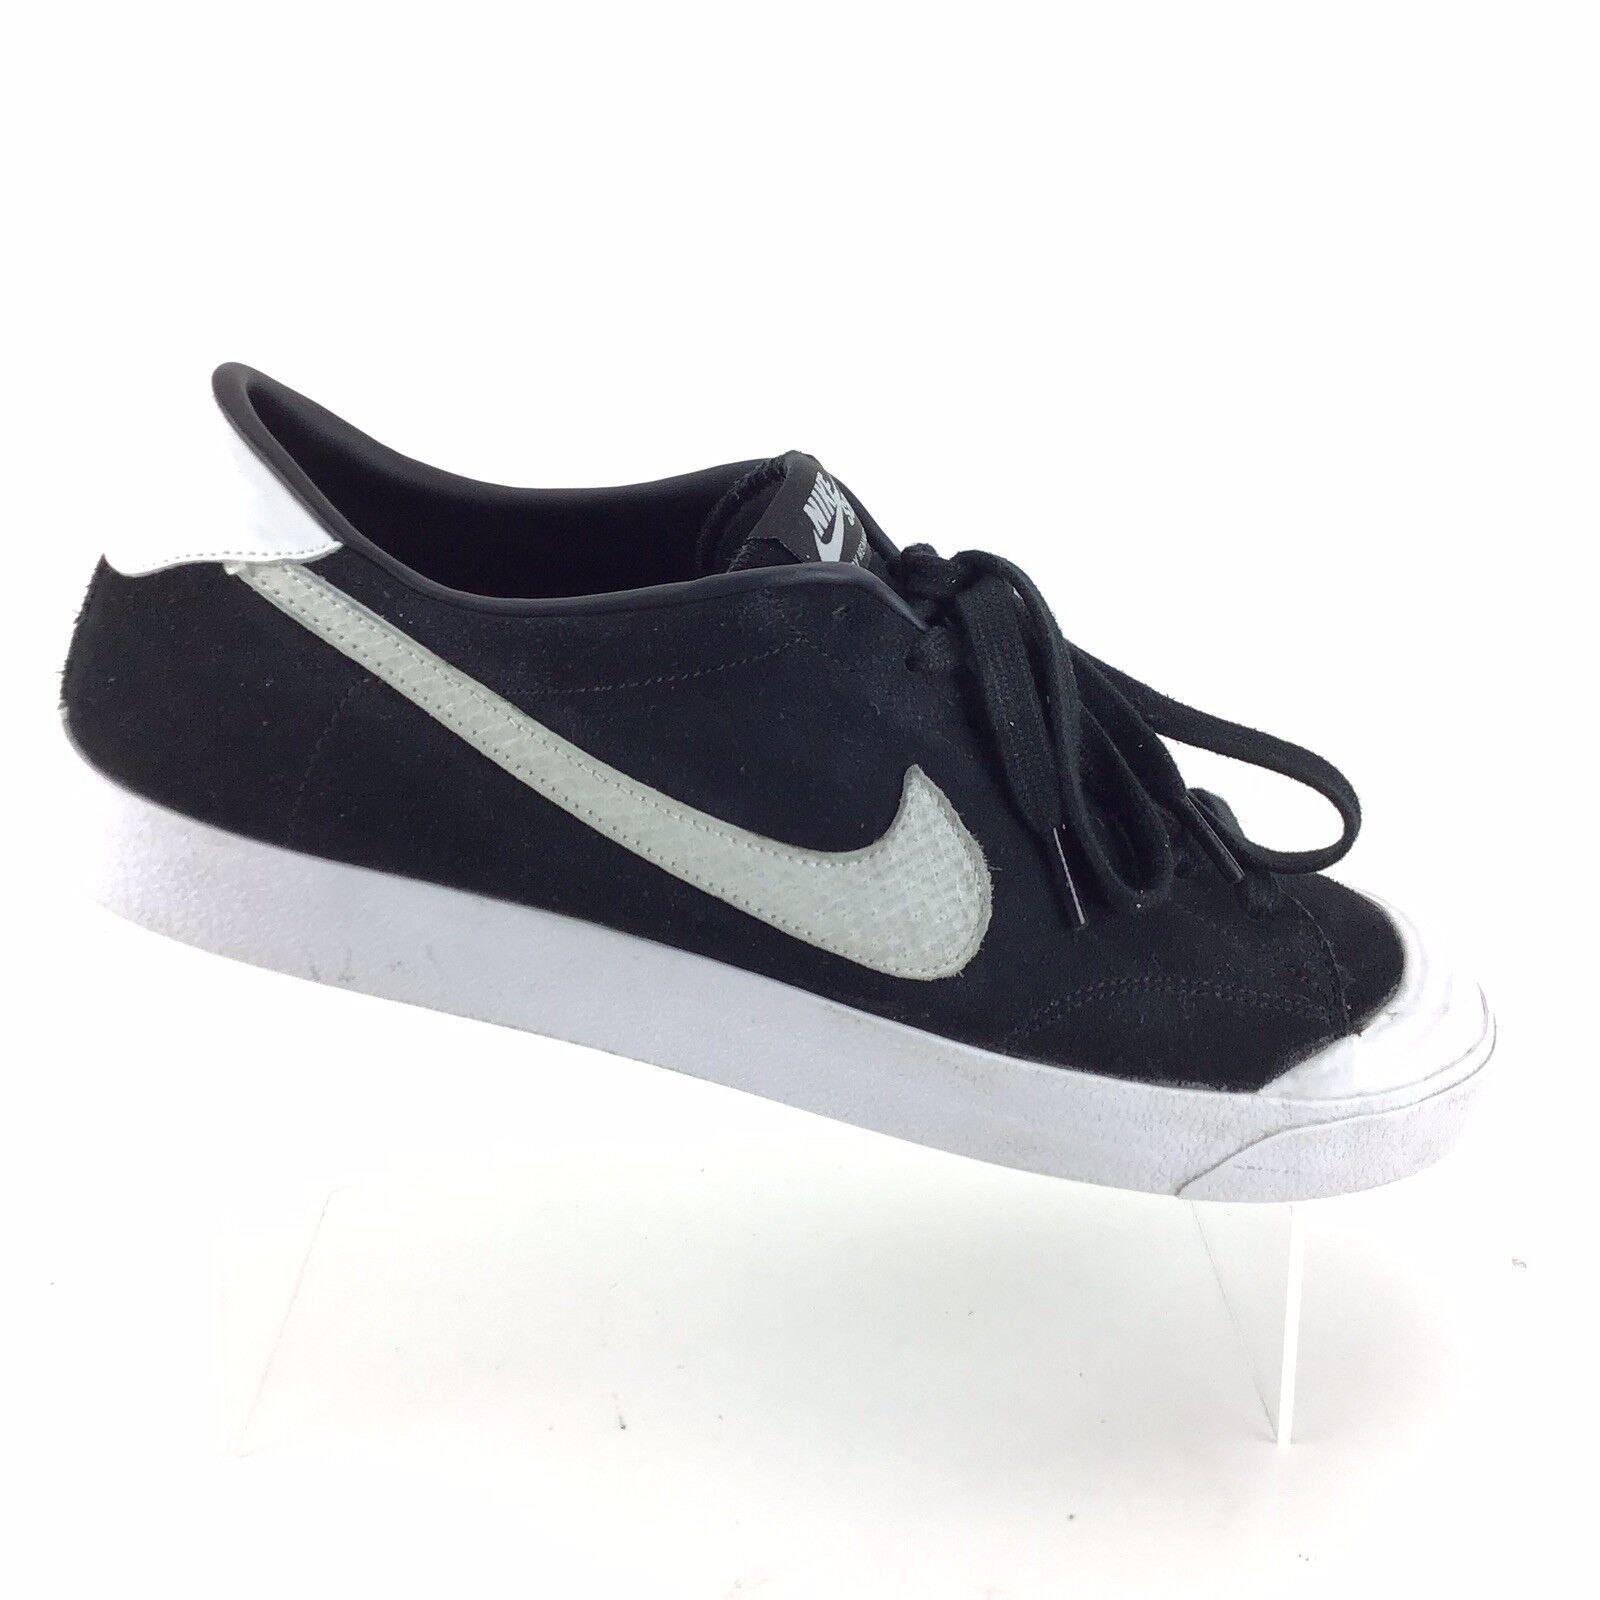 Nike cory kennedy sb skateboard gare sportive ginnastica mens 12,5 scarpe a9 | adottare  | Sig/Sig Ra Scarpa